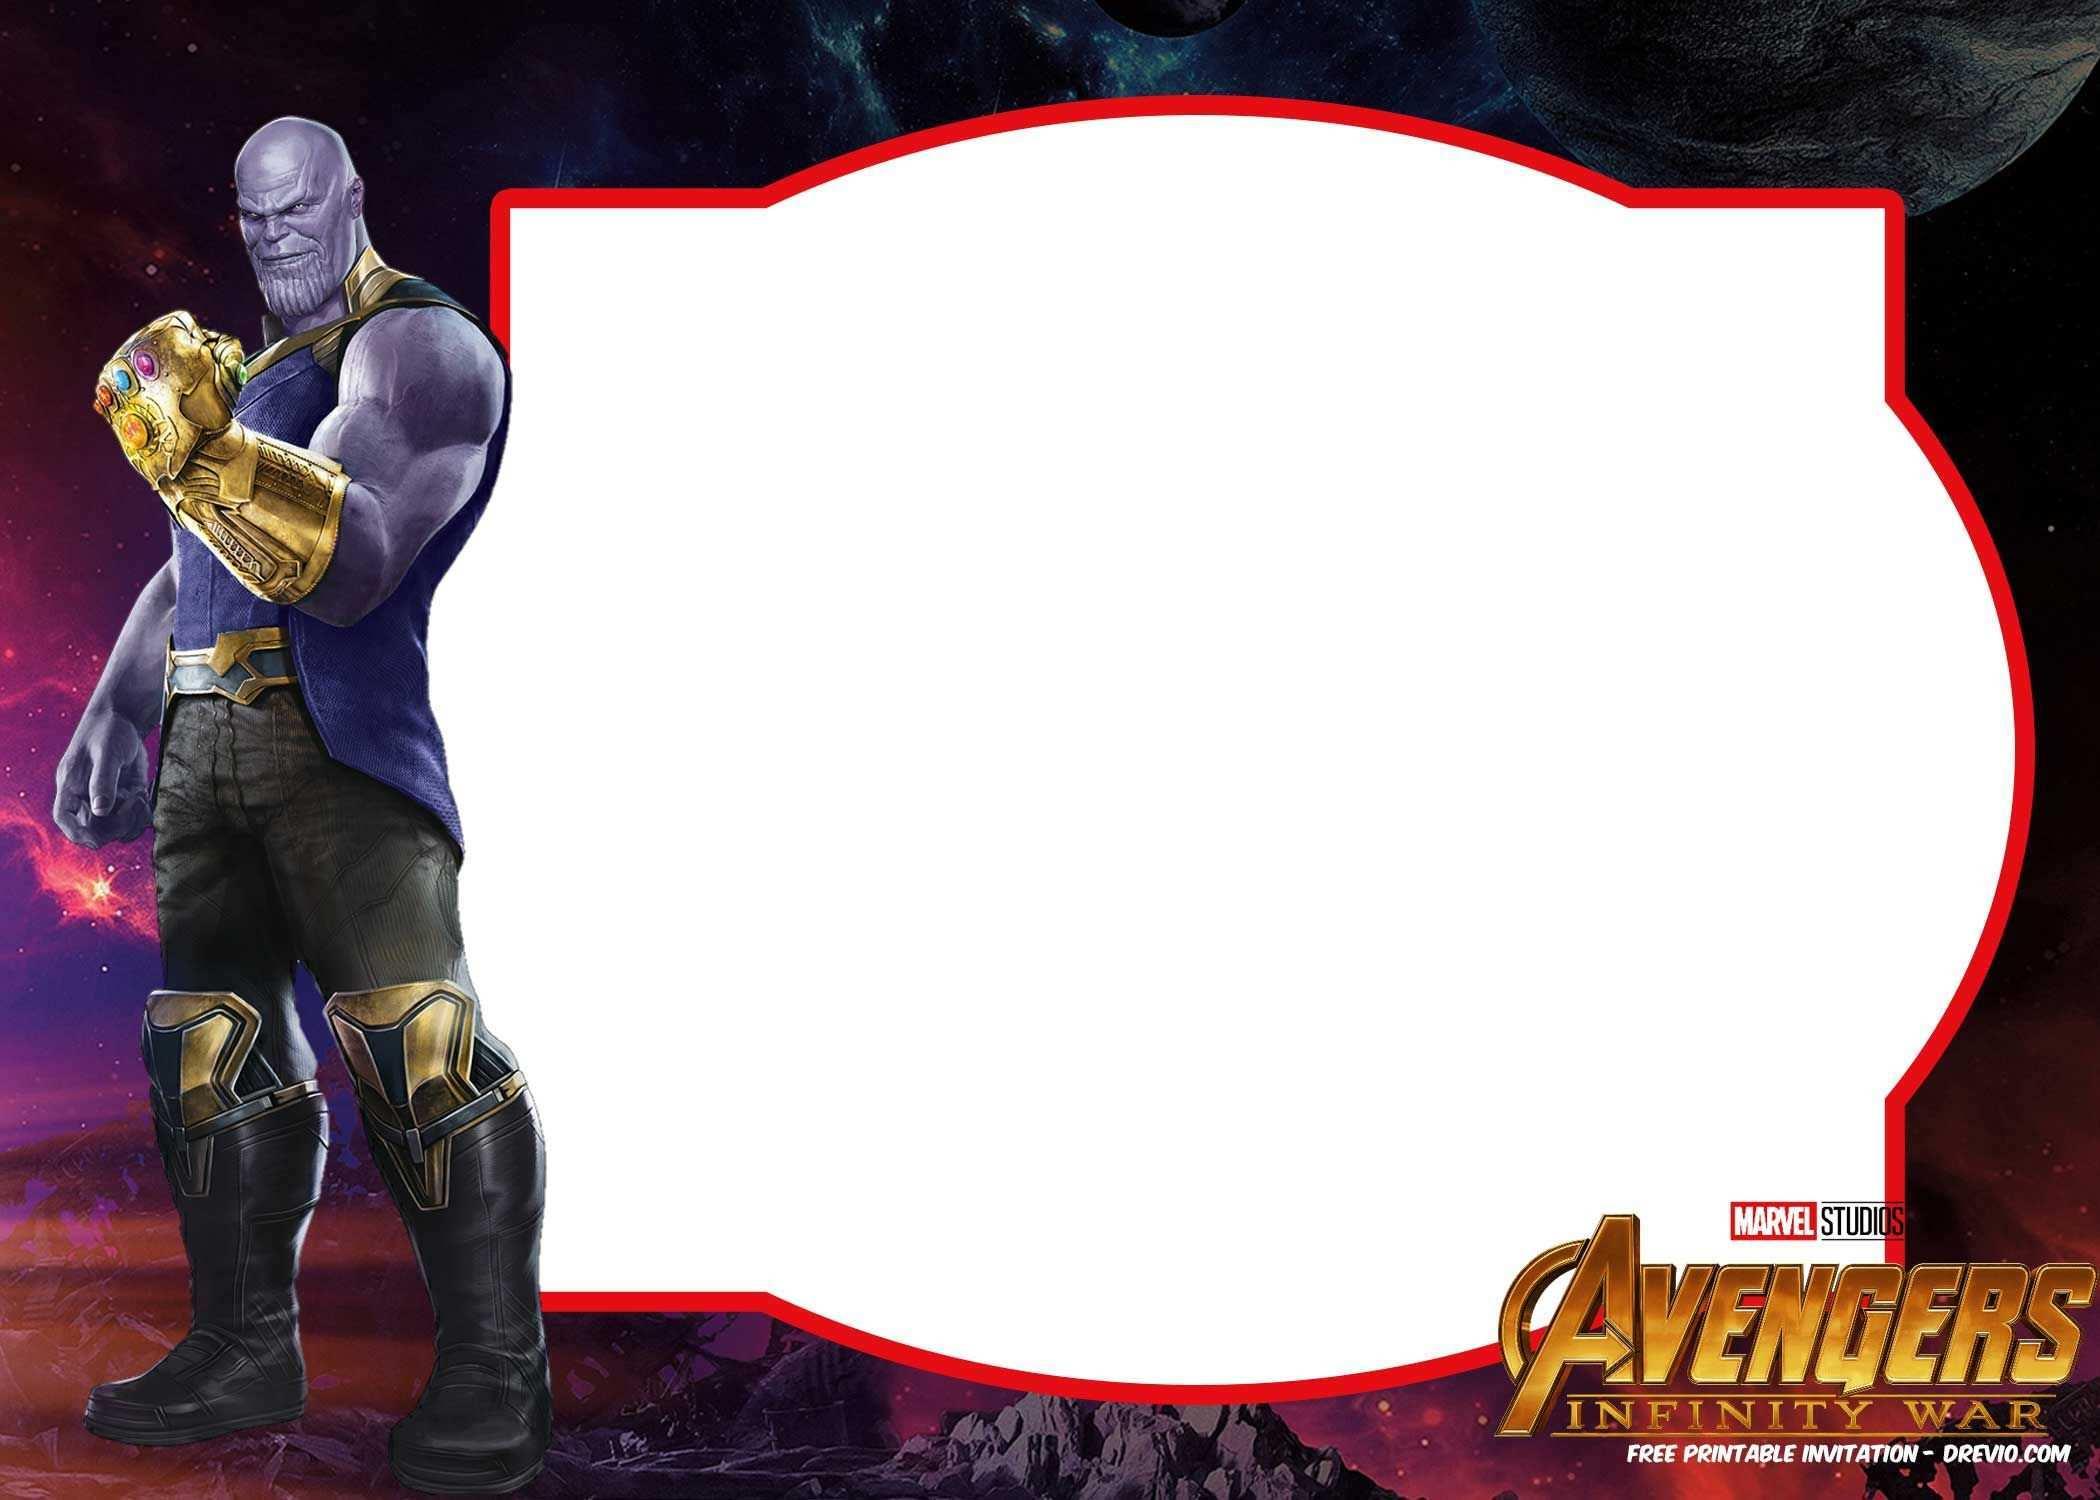 54 Customize Avengers Birthday Invitation Template in Photoshop for Avengers Birthday Invitation Template